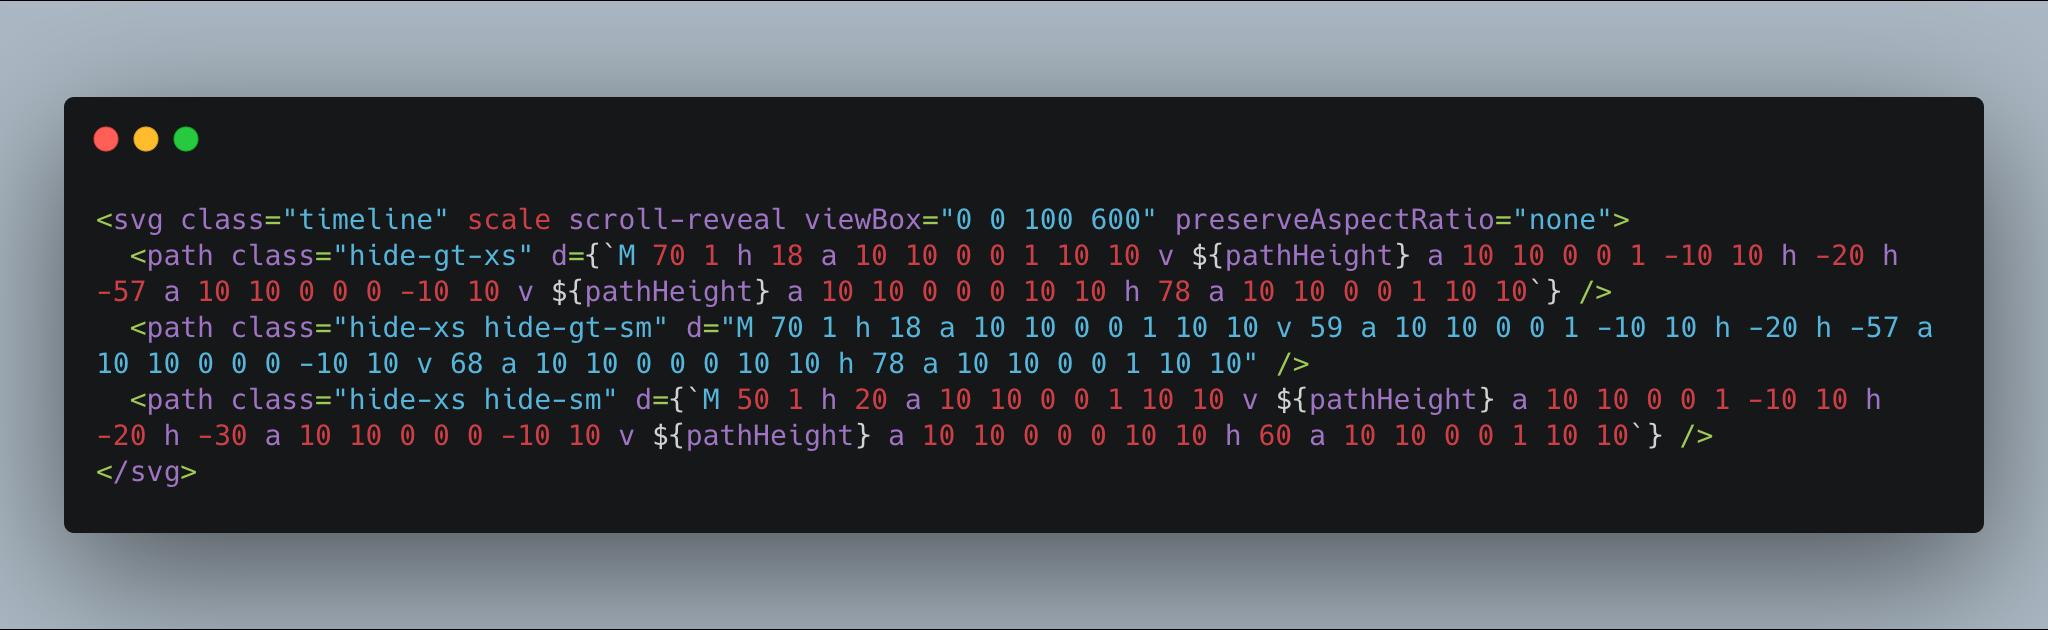 Responsive SVG HTML code